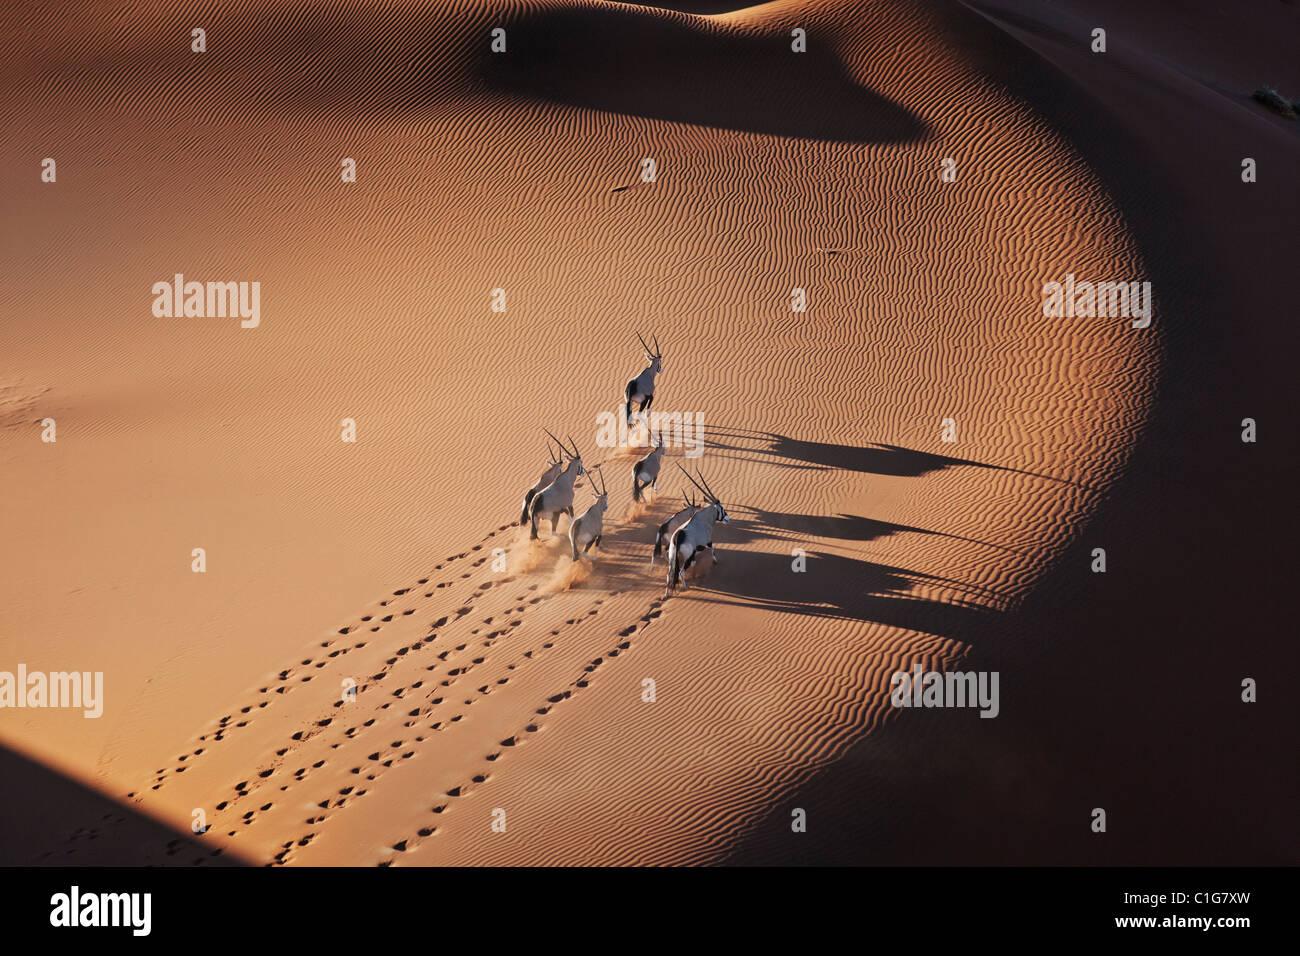 Gemsbok (Oryx gazella) In tipico habitat Deserto Deserto Namibiano dune di sabbia Immagini Stock